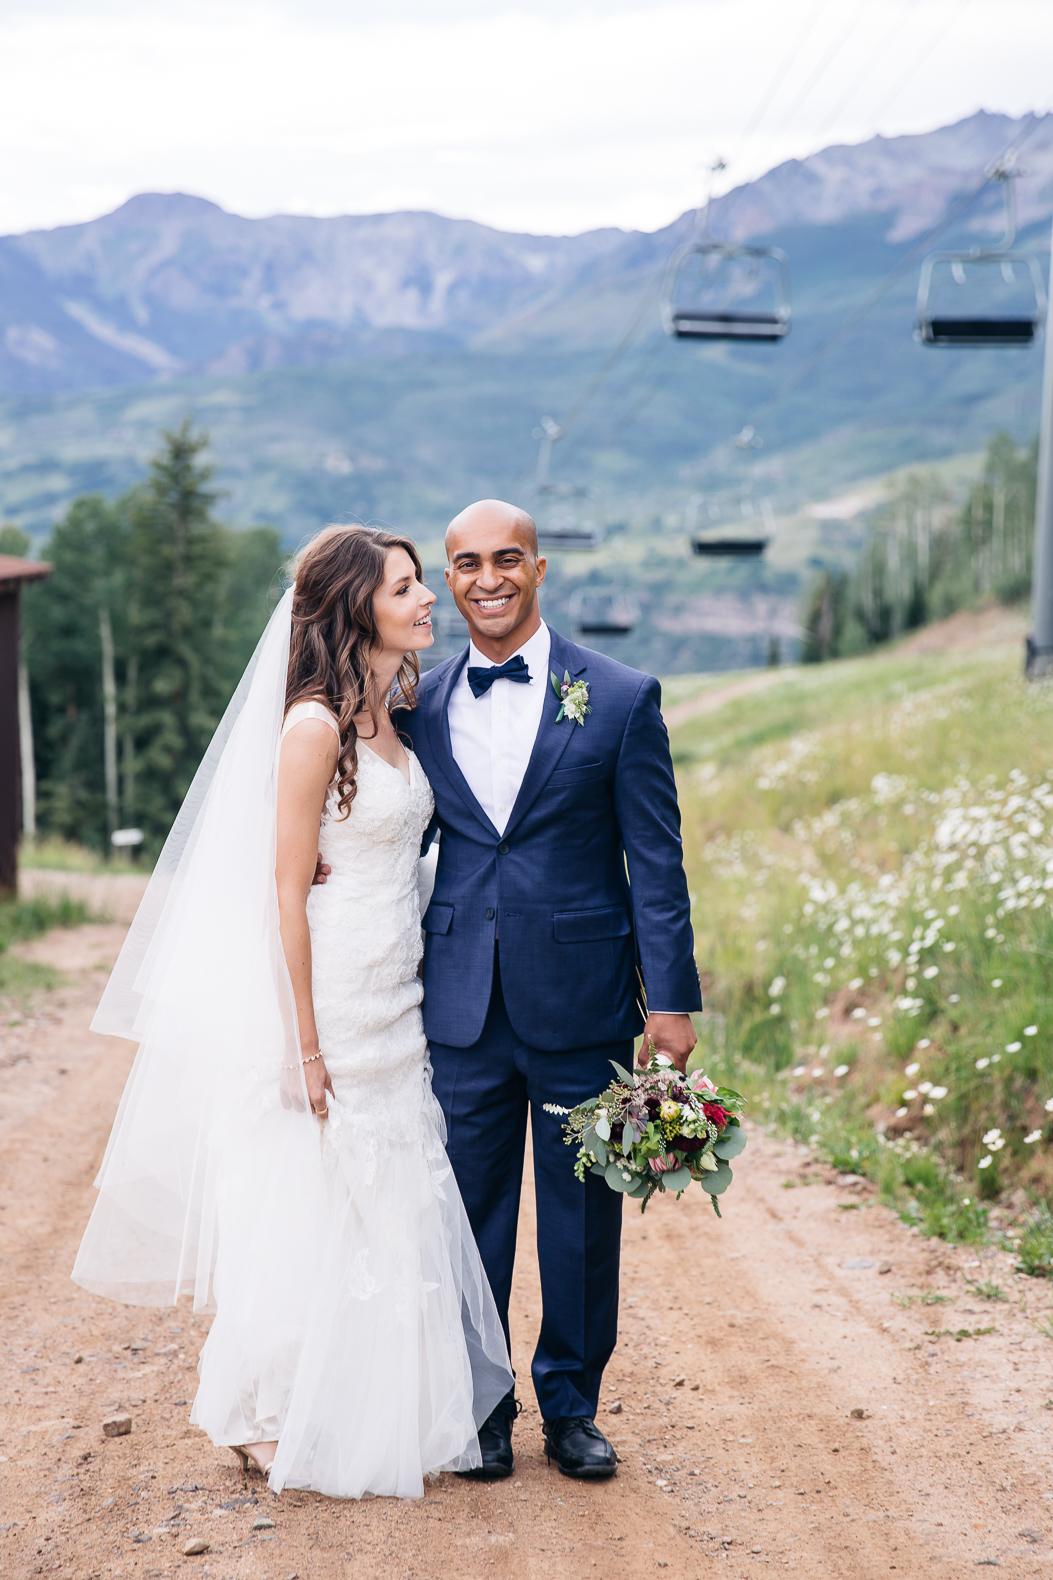 Abie Livesay Photography - Telluride Wedding Photographer - Gorrono Ranch Wedding - Brooke Chaz-773.jpg